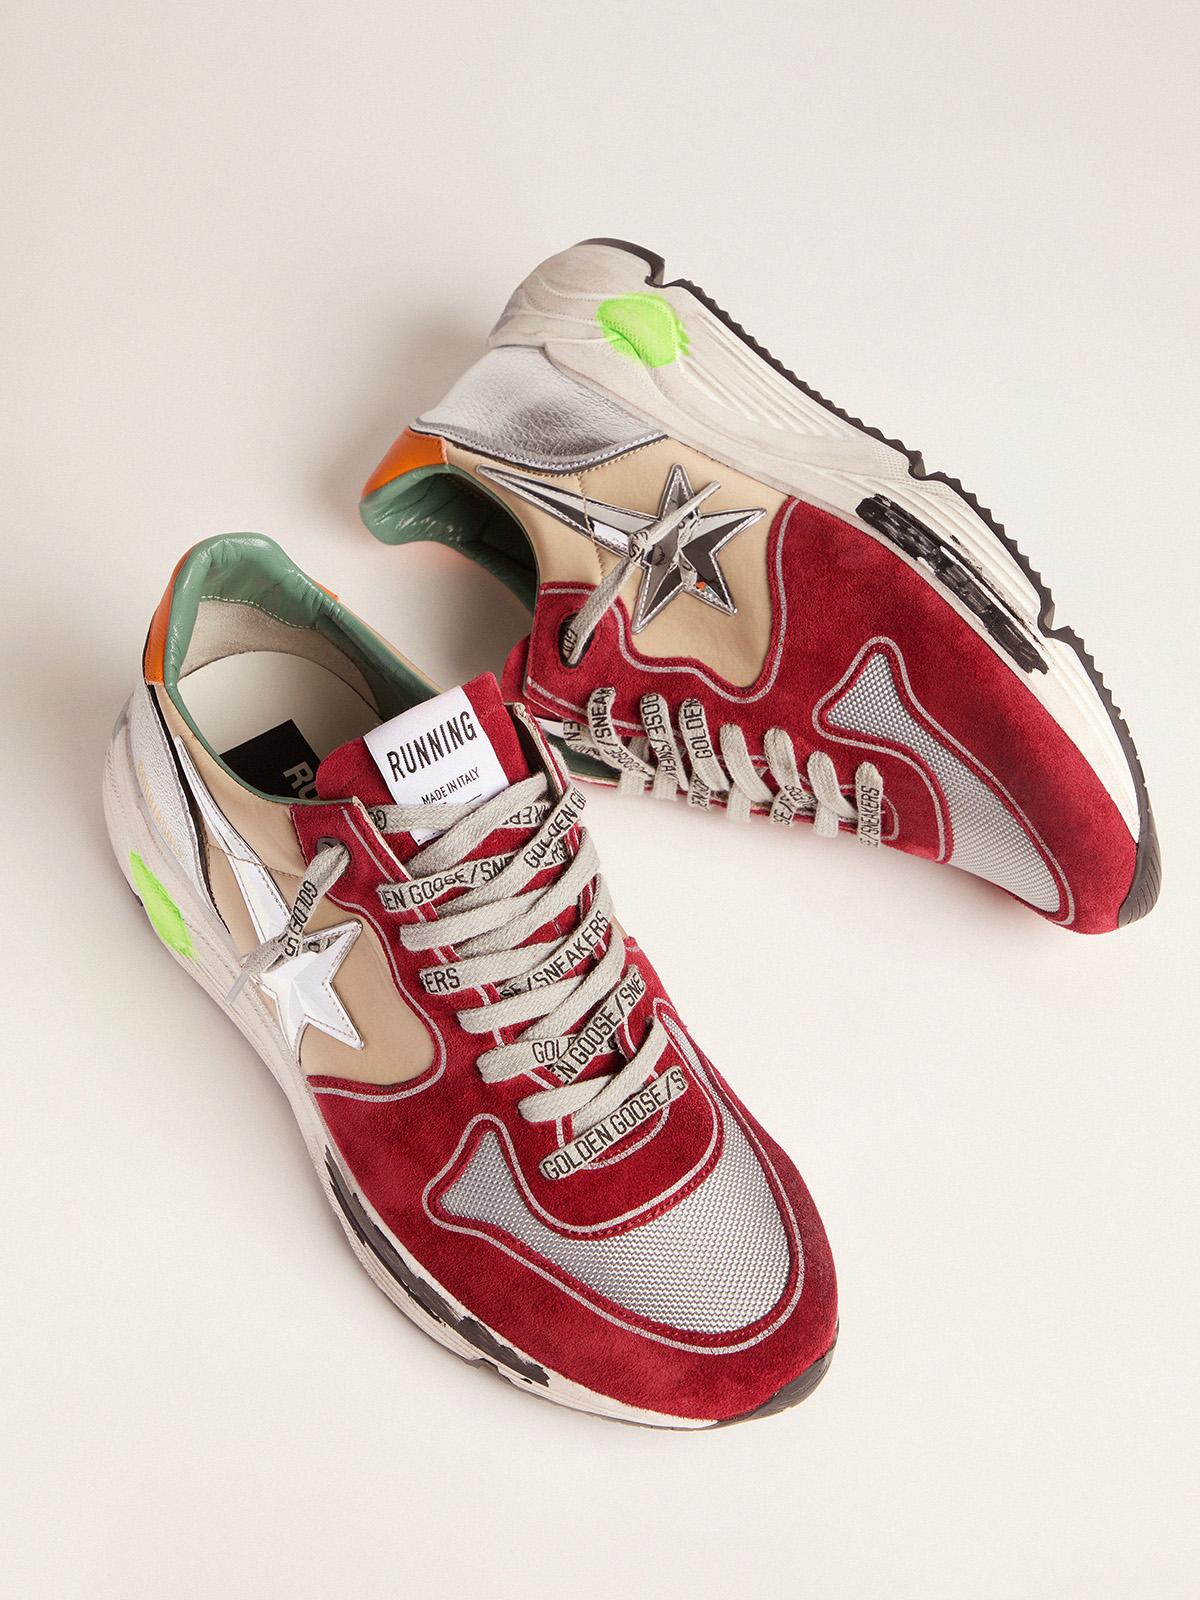 Golden Goose - Running Sole sneakers with 3D star and orange heel tab in